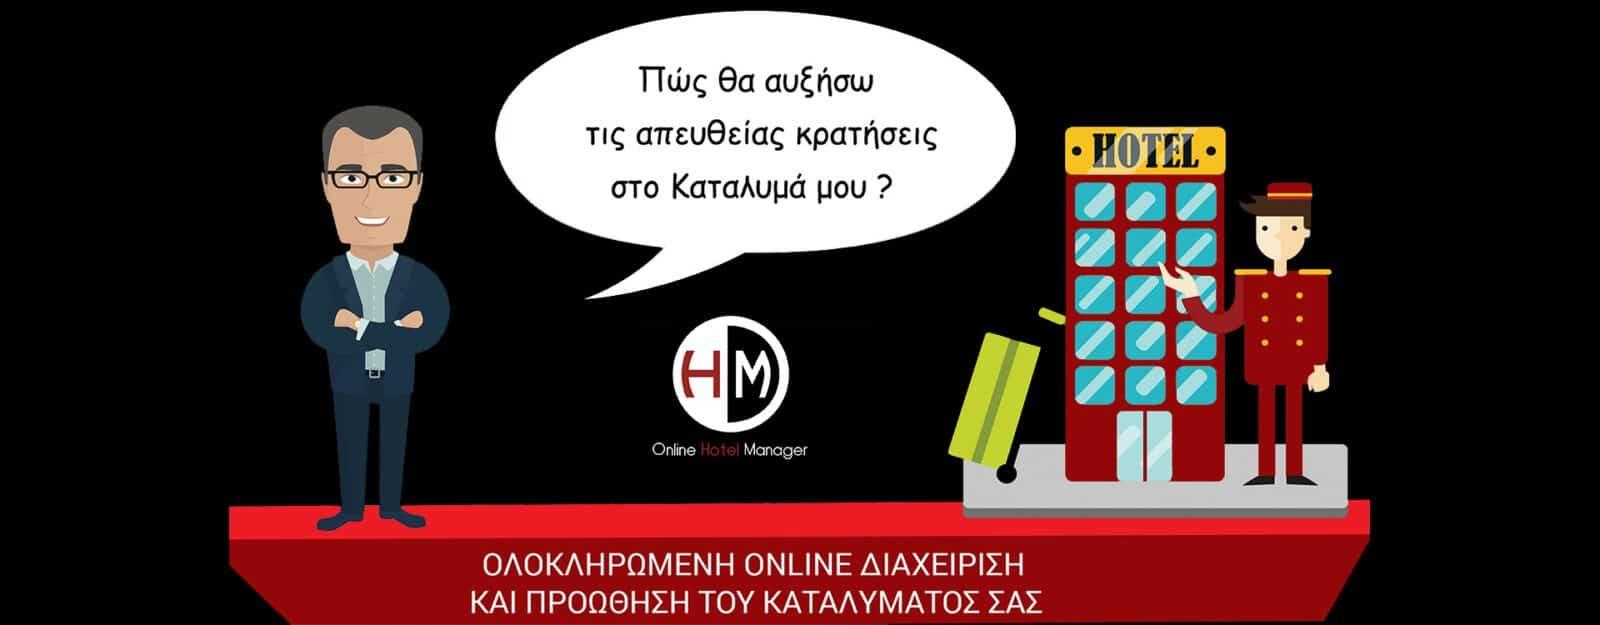 Online hotel manager